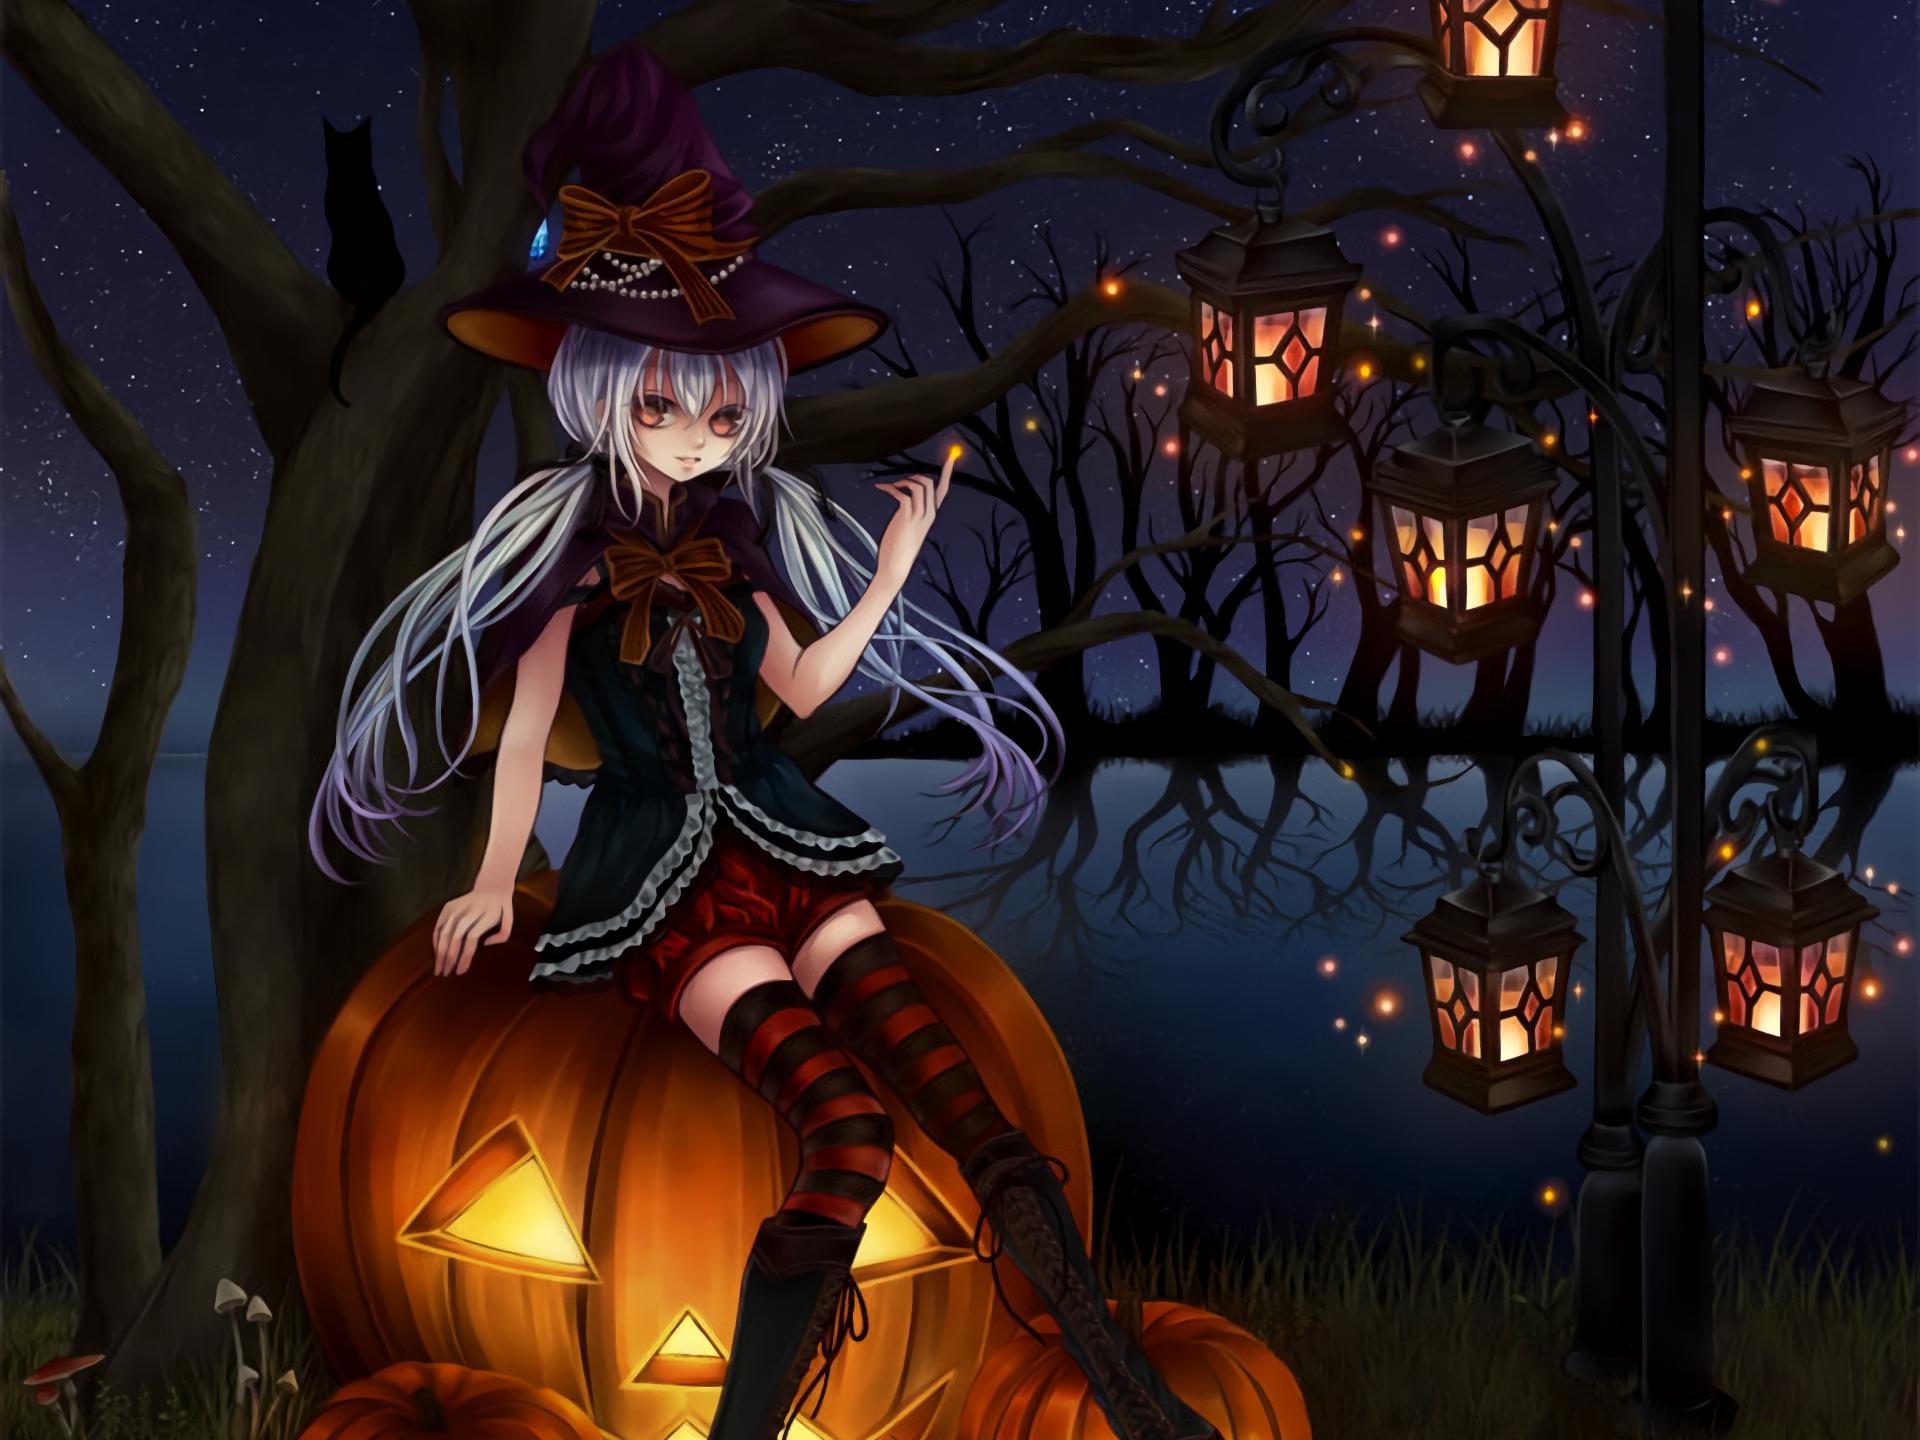 Holiday - Halloween  Holiday Anime Girl Jack-o'-lantern Night Lantern White Hair Witch Hat Wallpaper